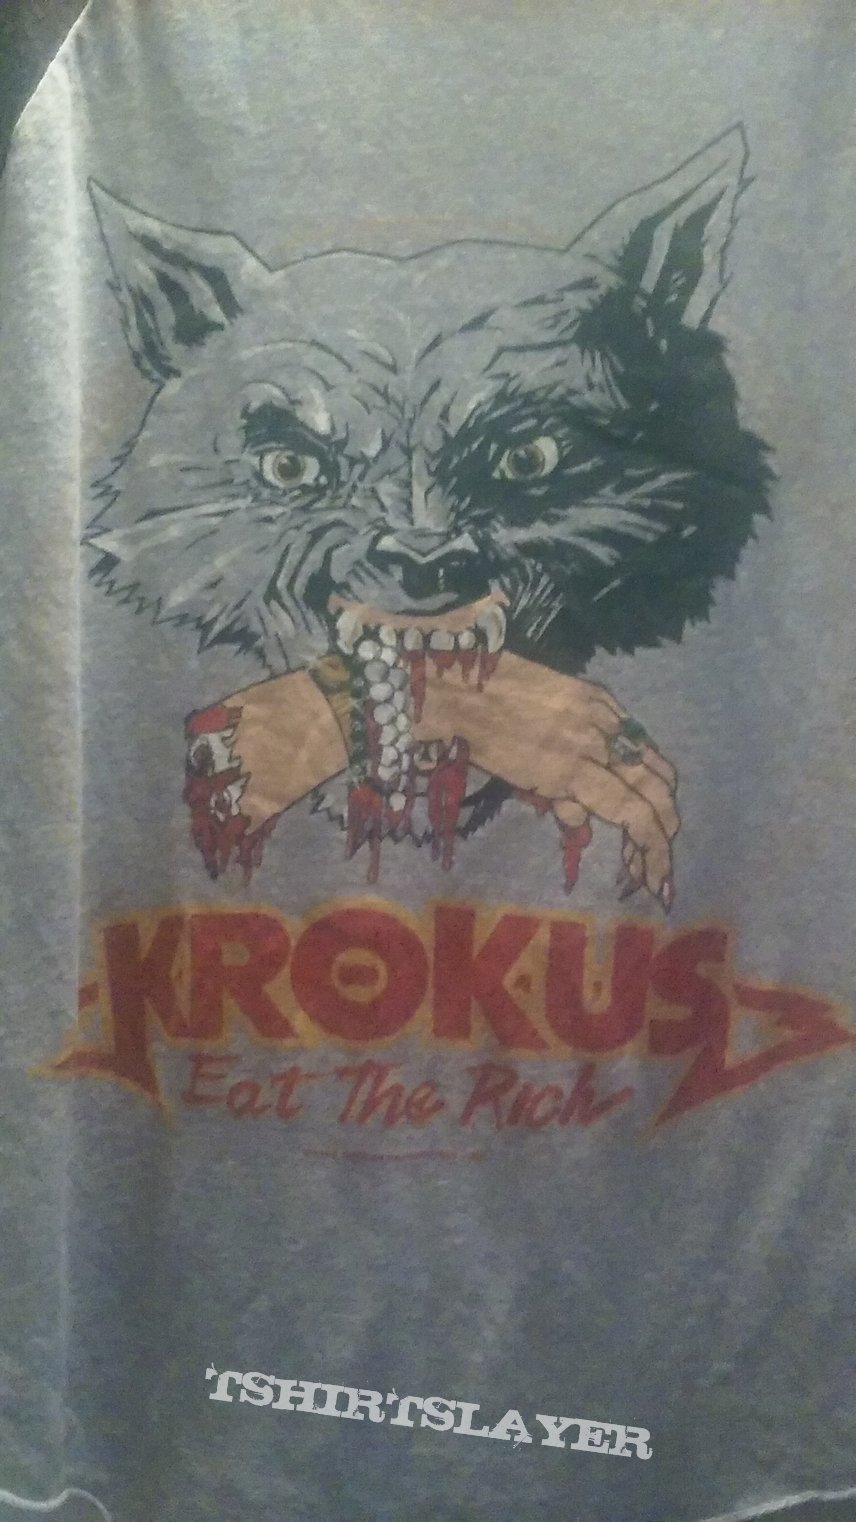 Krokus Eat the Rich Jersey